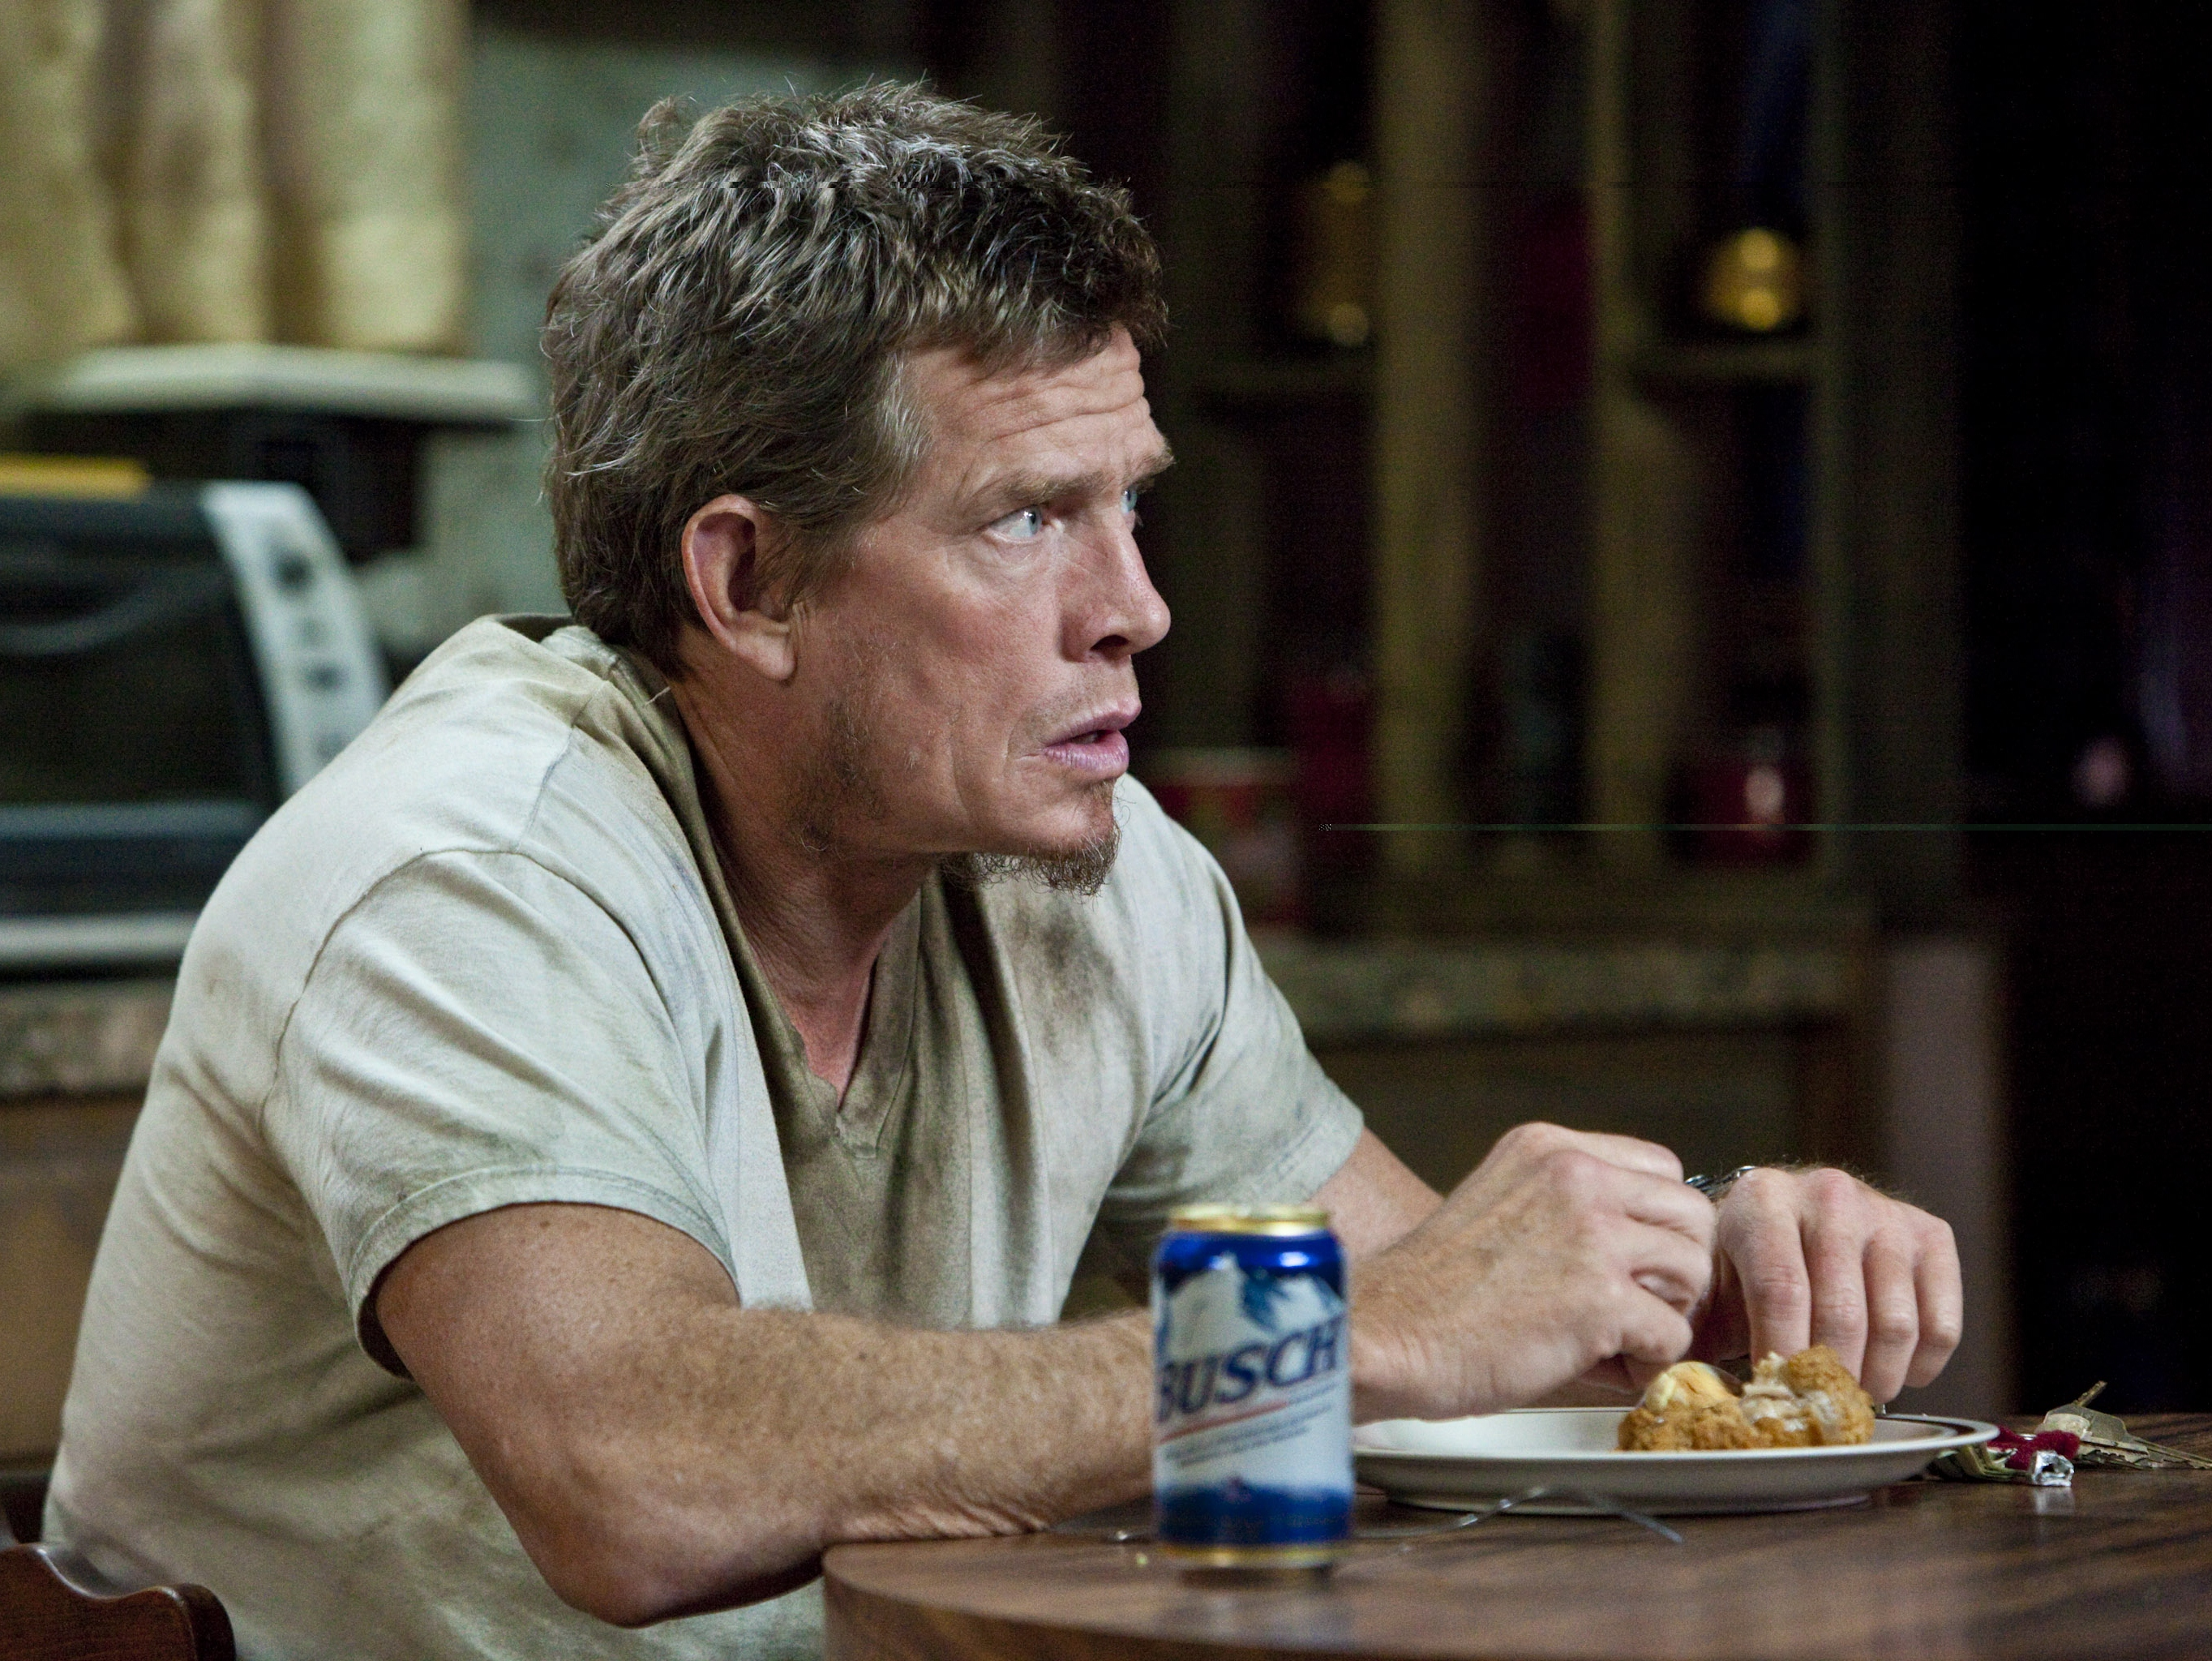 BH Interview: Thomas Haden Church on Getting Dirty for 'Killer Joe'